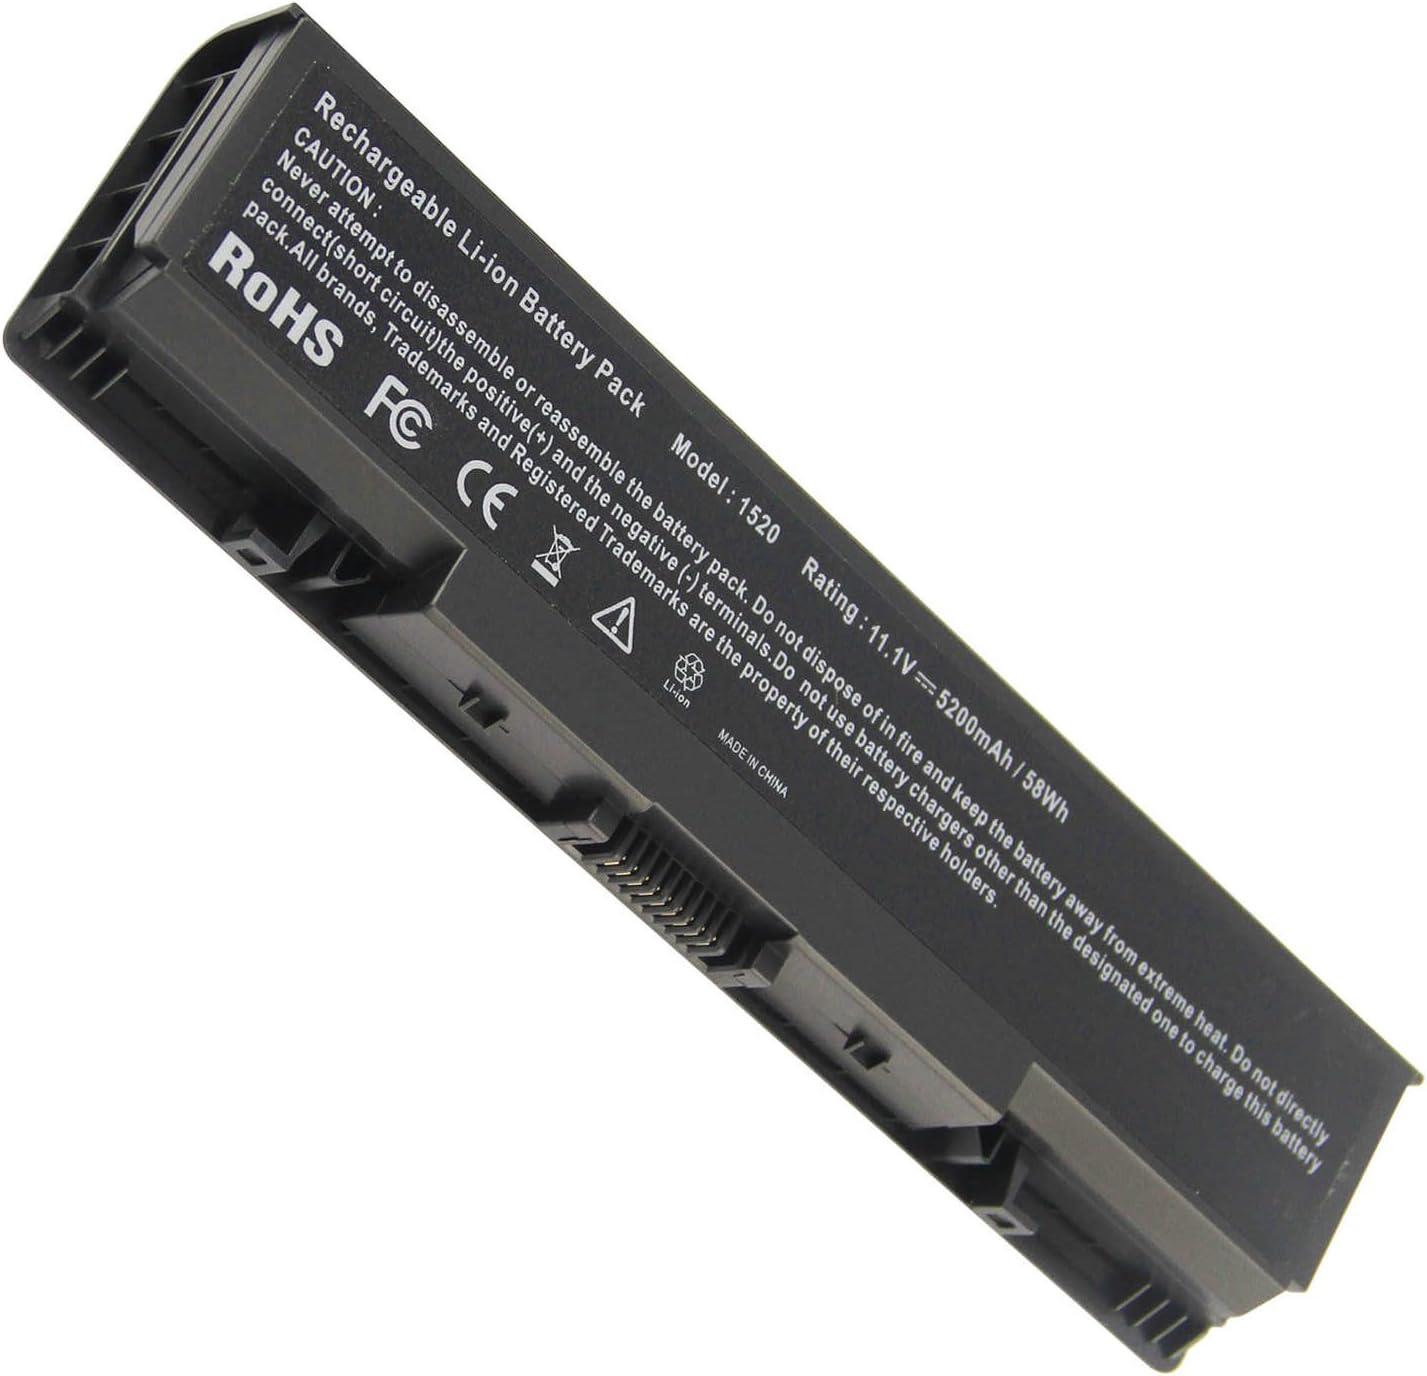 Fancy Buying New Laptop Battery for Dell Inspiron 1521 1520 1721 pp22l pp22x ; Dell Vostro 1500 1700, fits P/N FK890 FP282 GK476 GK479-12 Months Warranty (6 Cells 11.1V 5200mAh)